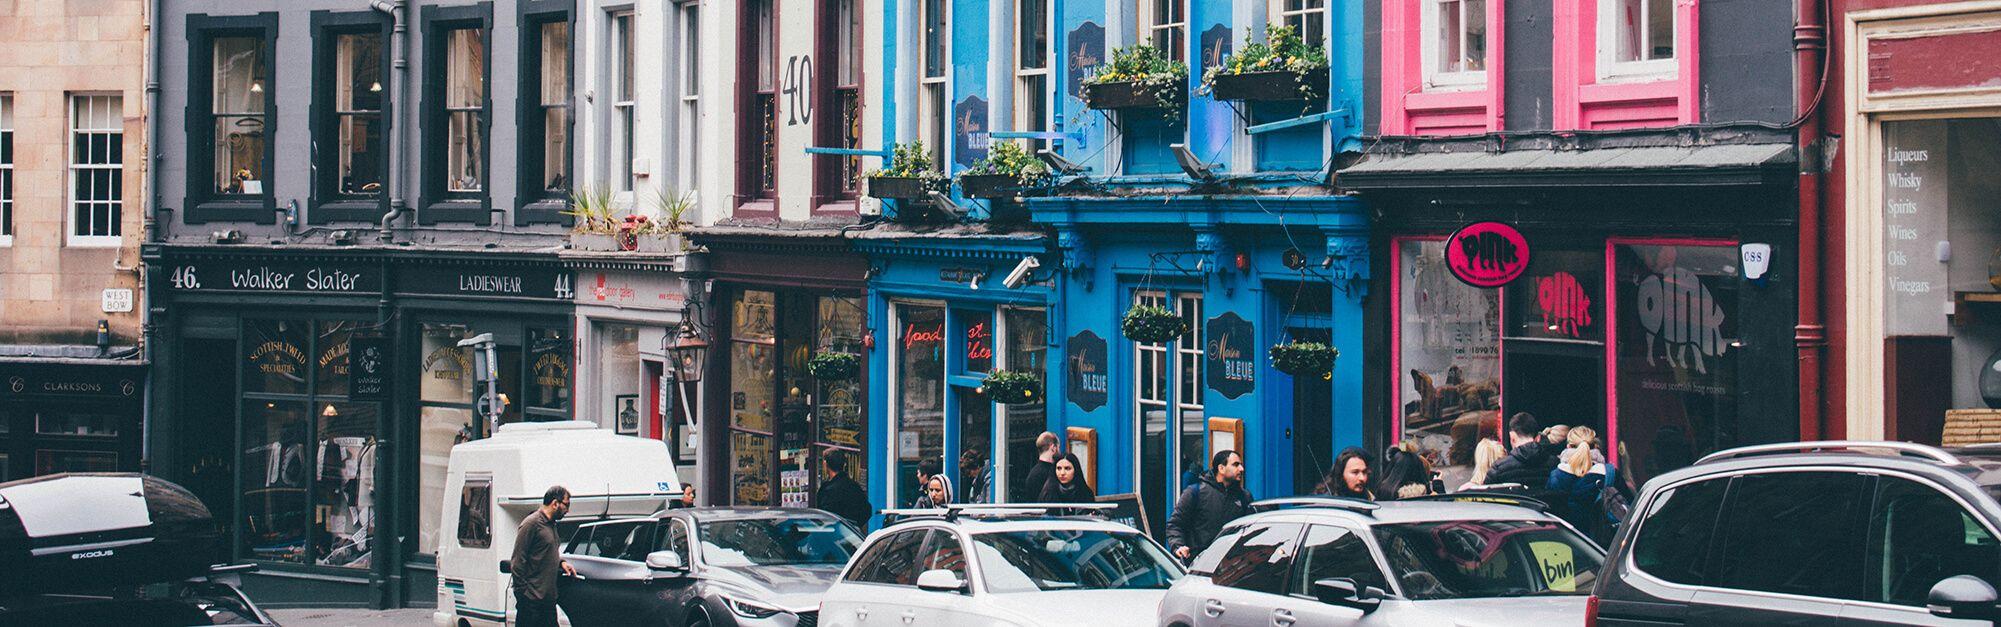 Edinburgh homes are the tidiest in UK